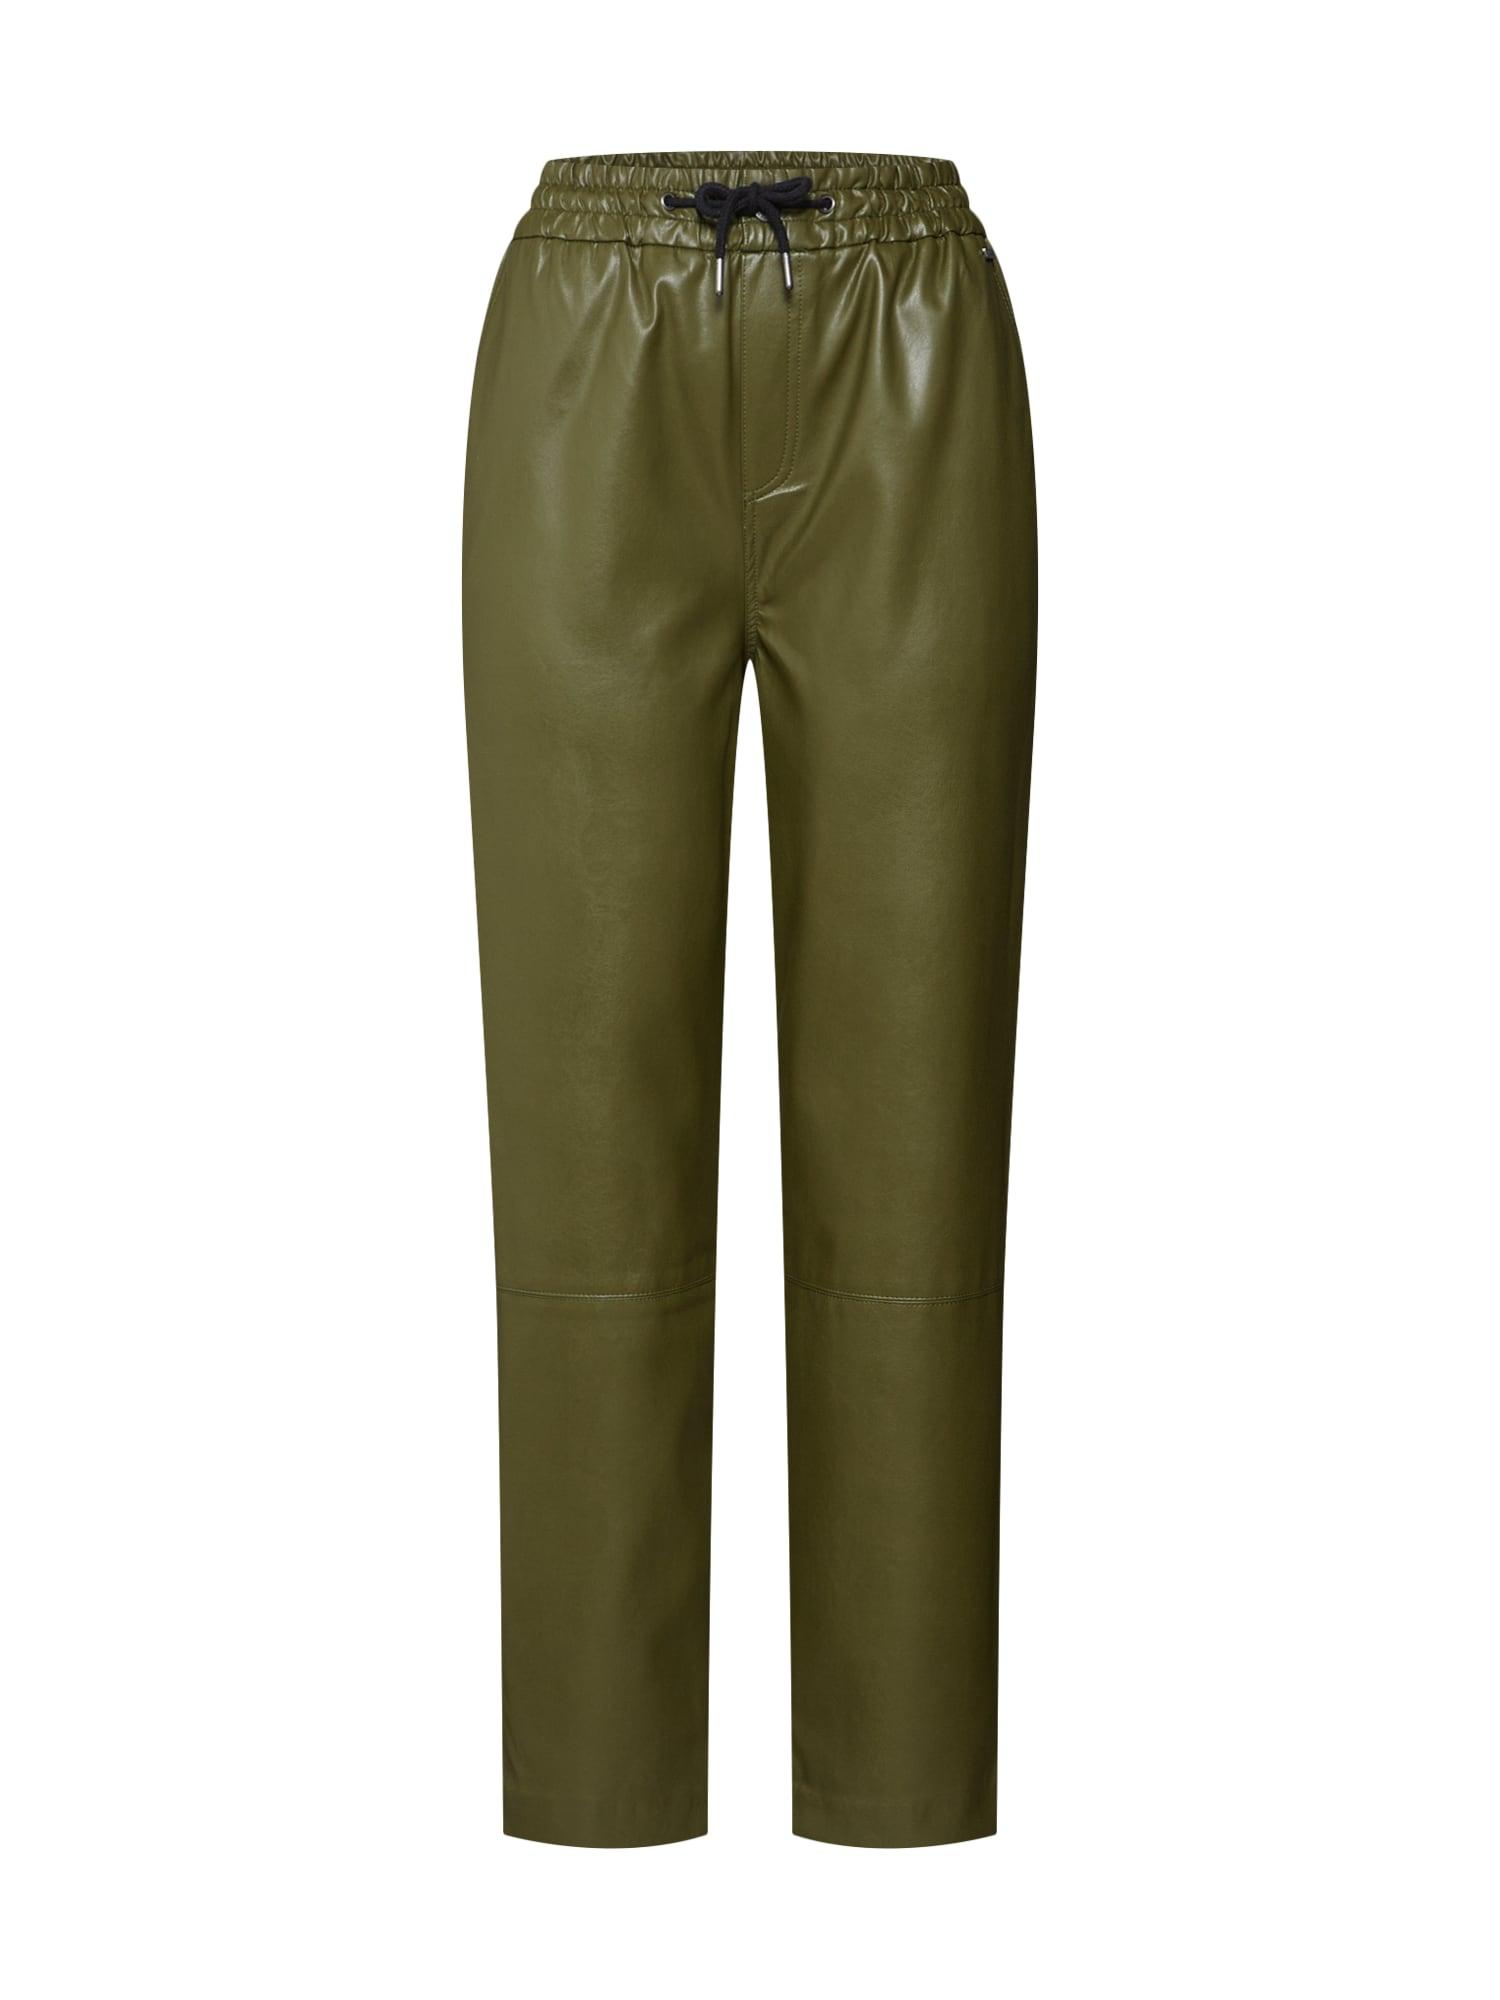 Pepe Jeans Kelnės 'Moira' žalia